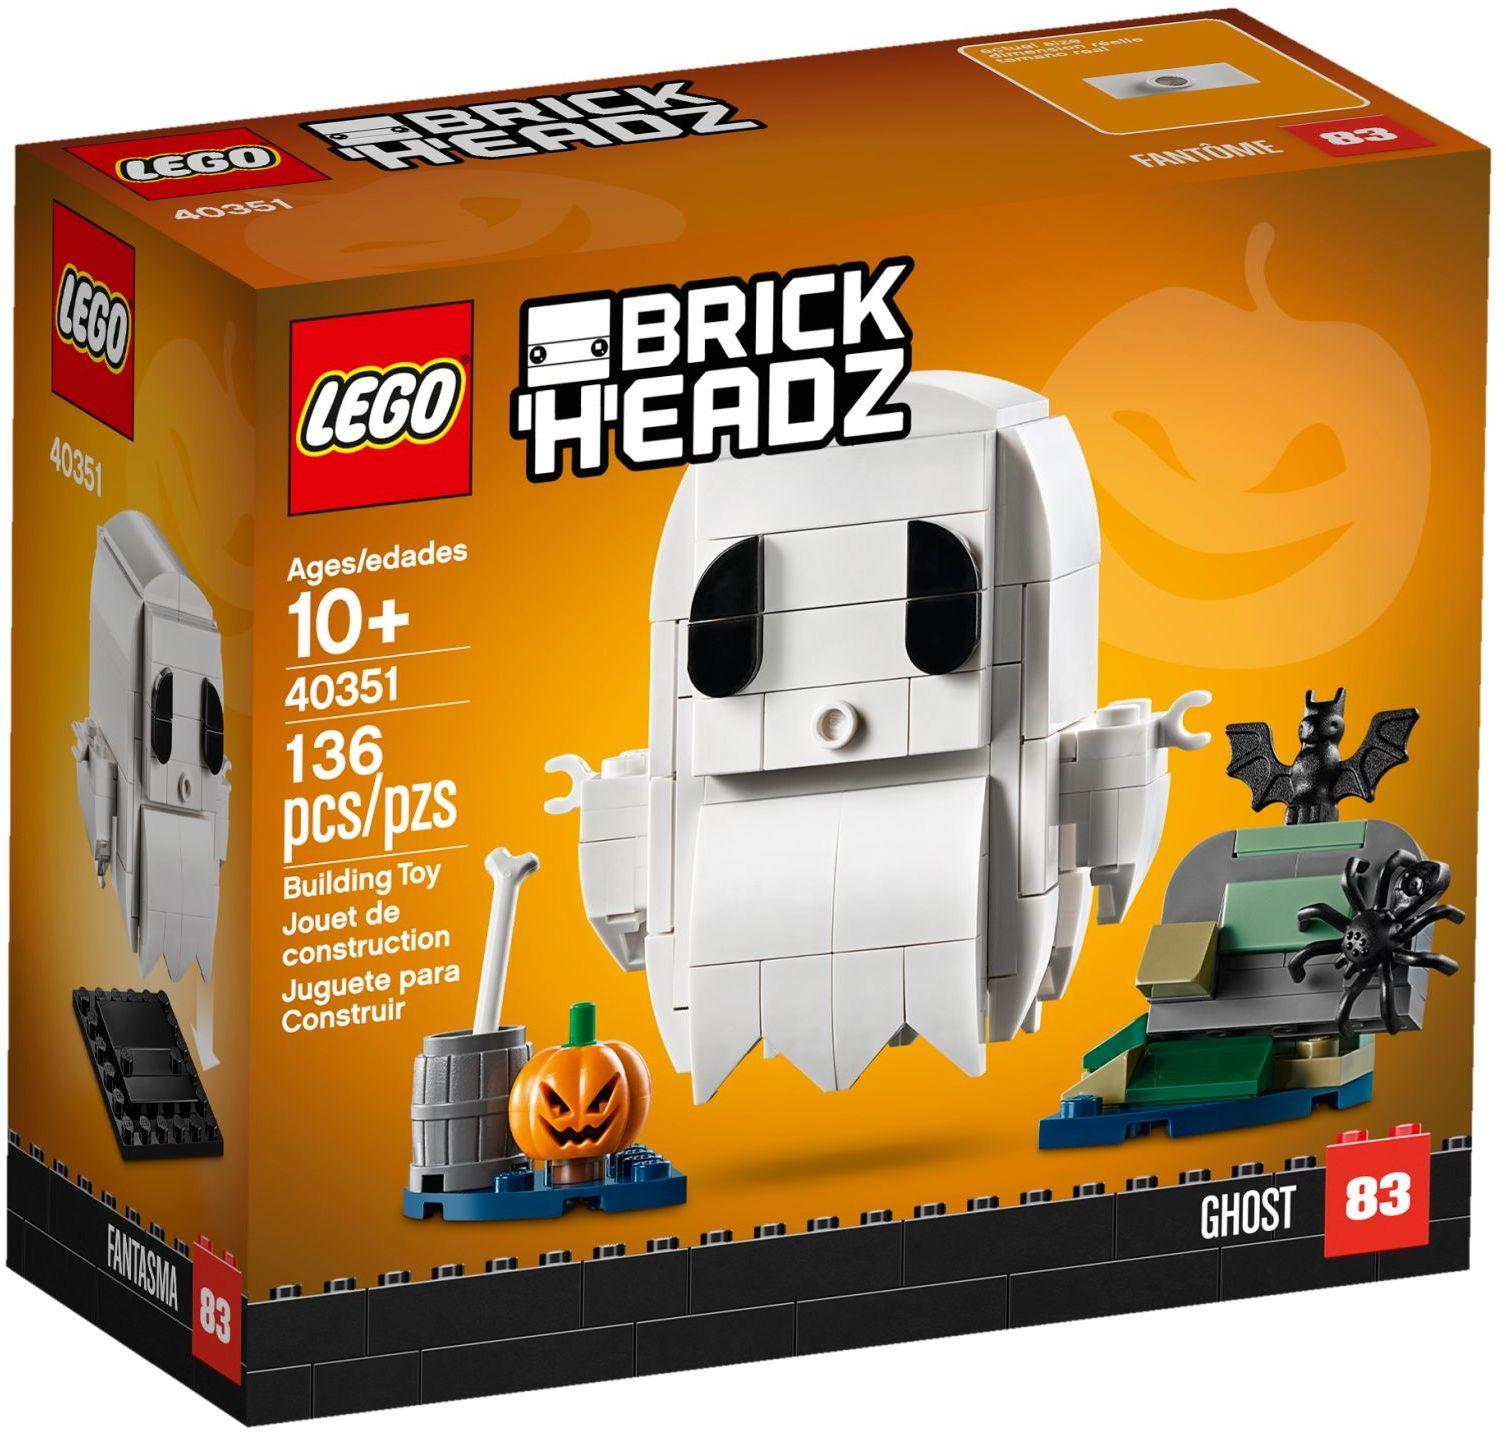 40351 Lego Halloween Ghost - Con ma